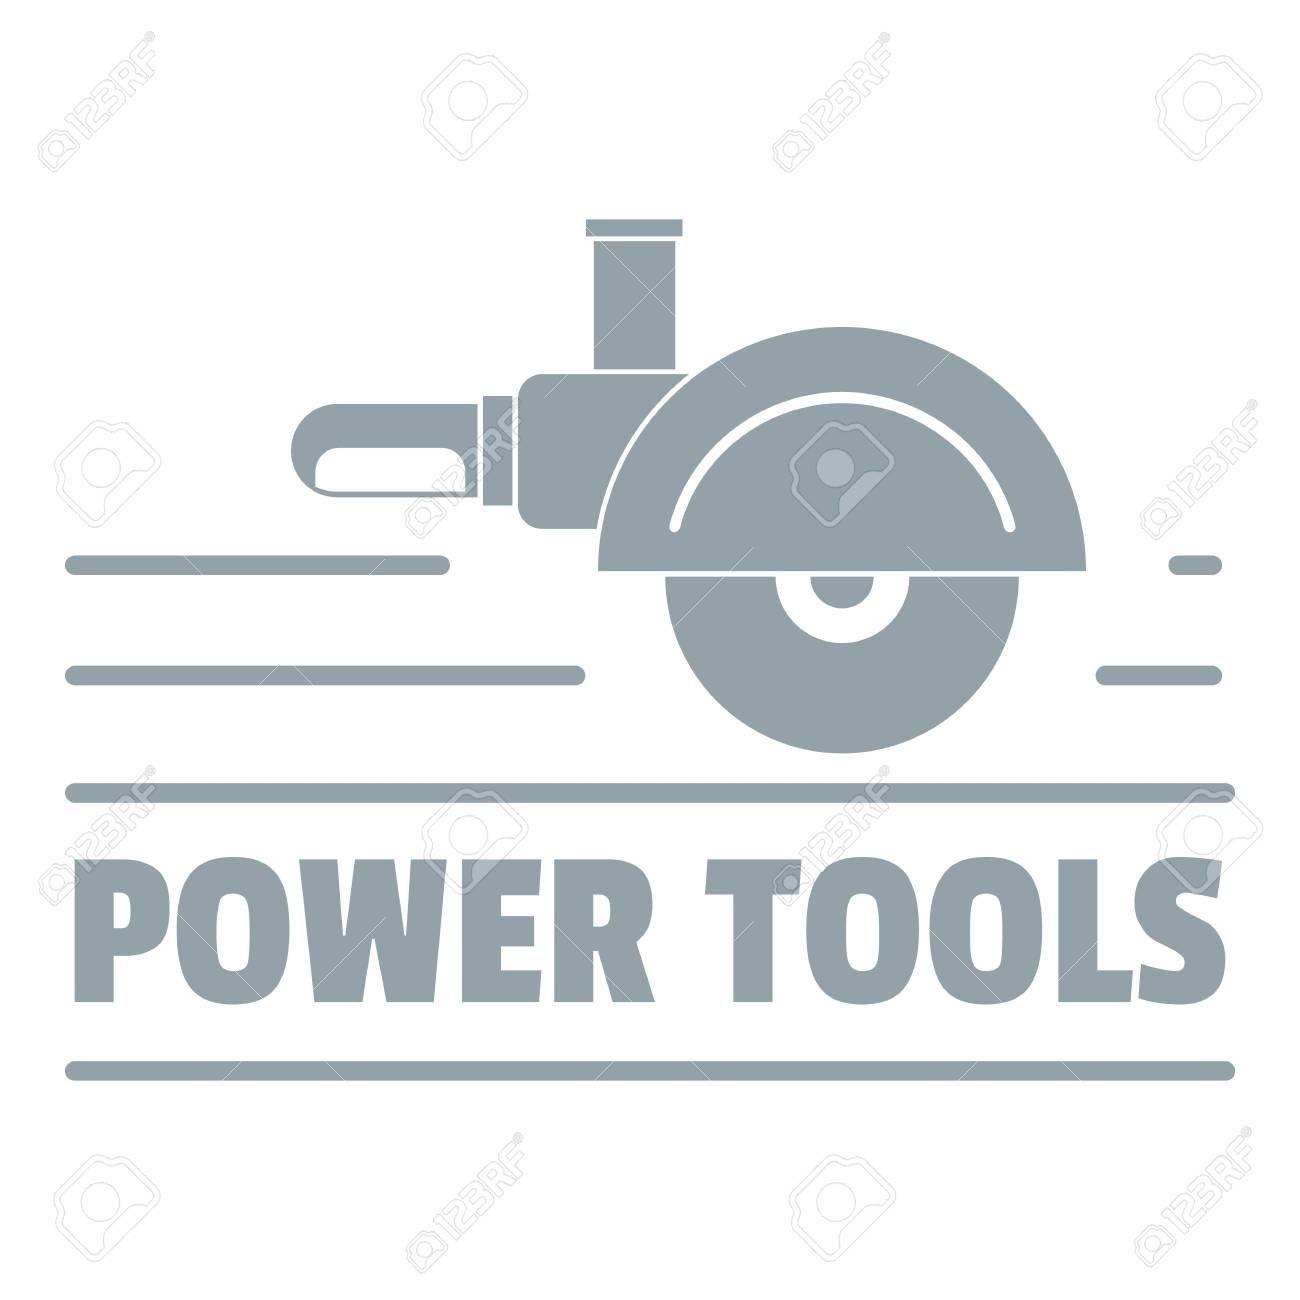 REX POWER TOOLS